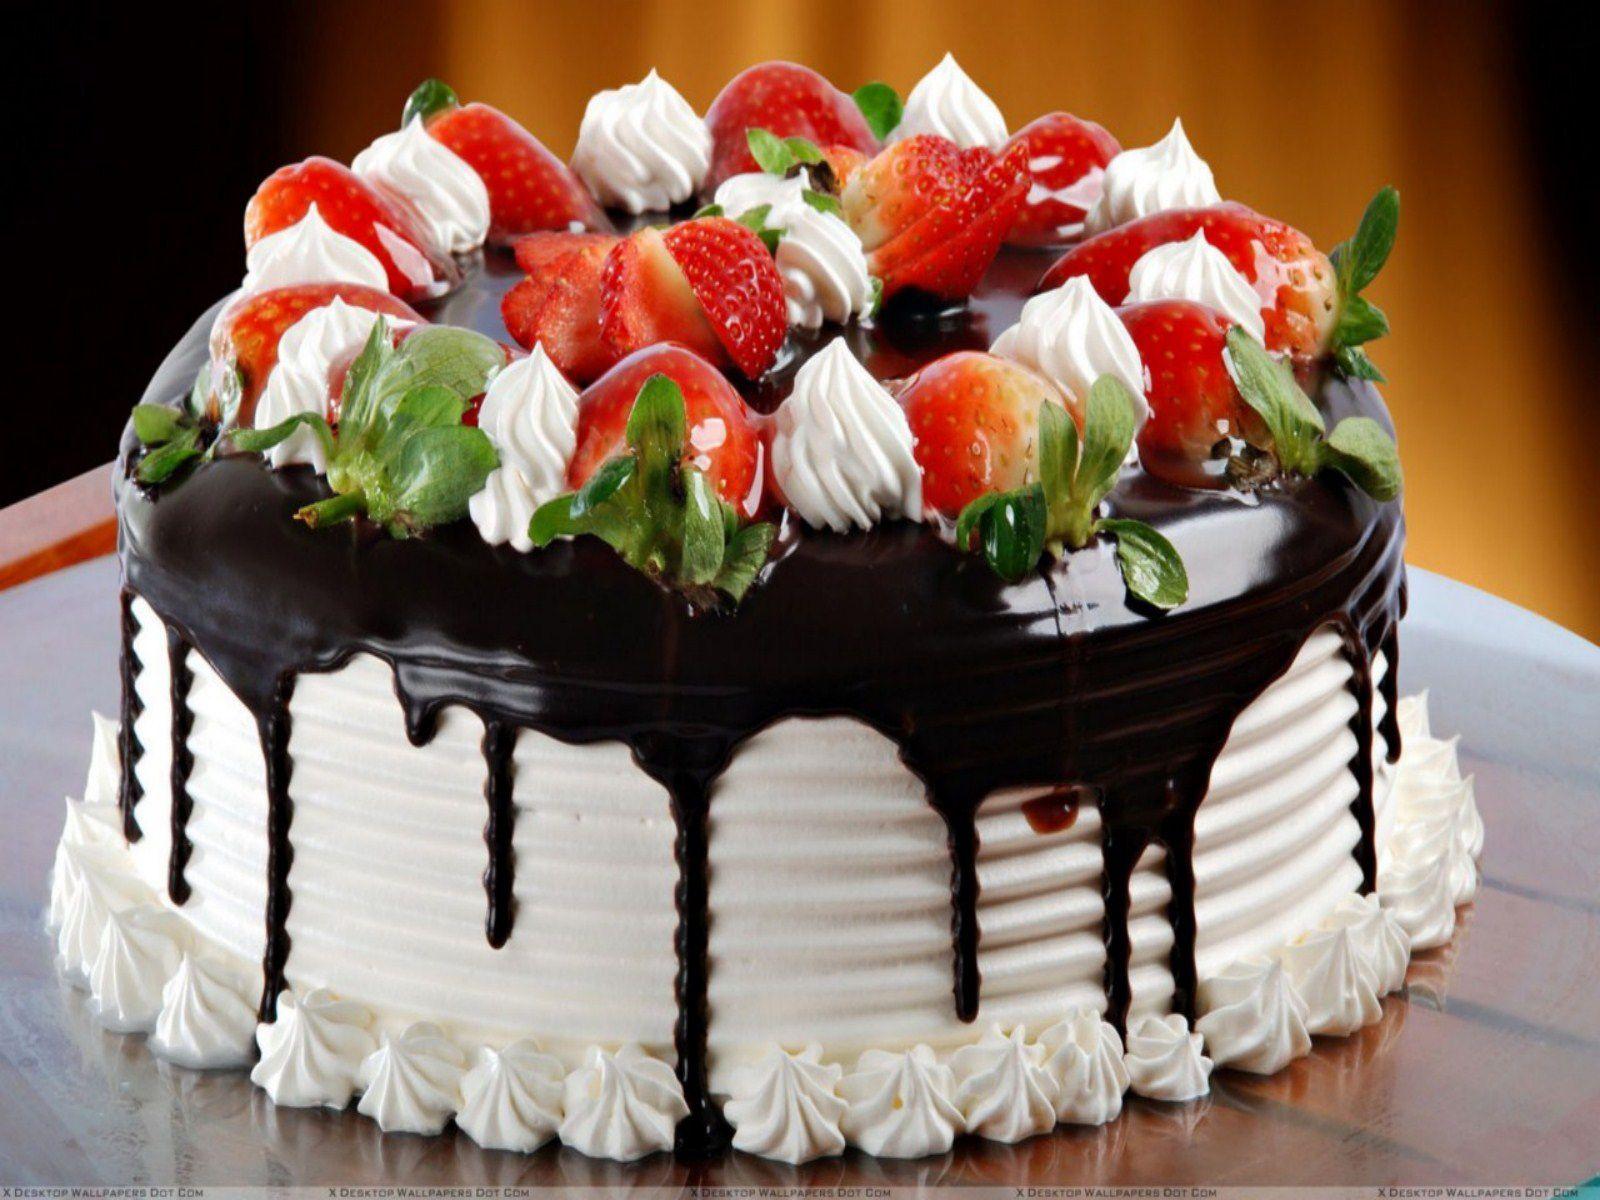 Birthday Cakes Images Bakery Birthday Cakes Amazing Taste Walmart